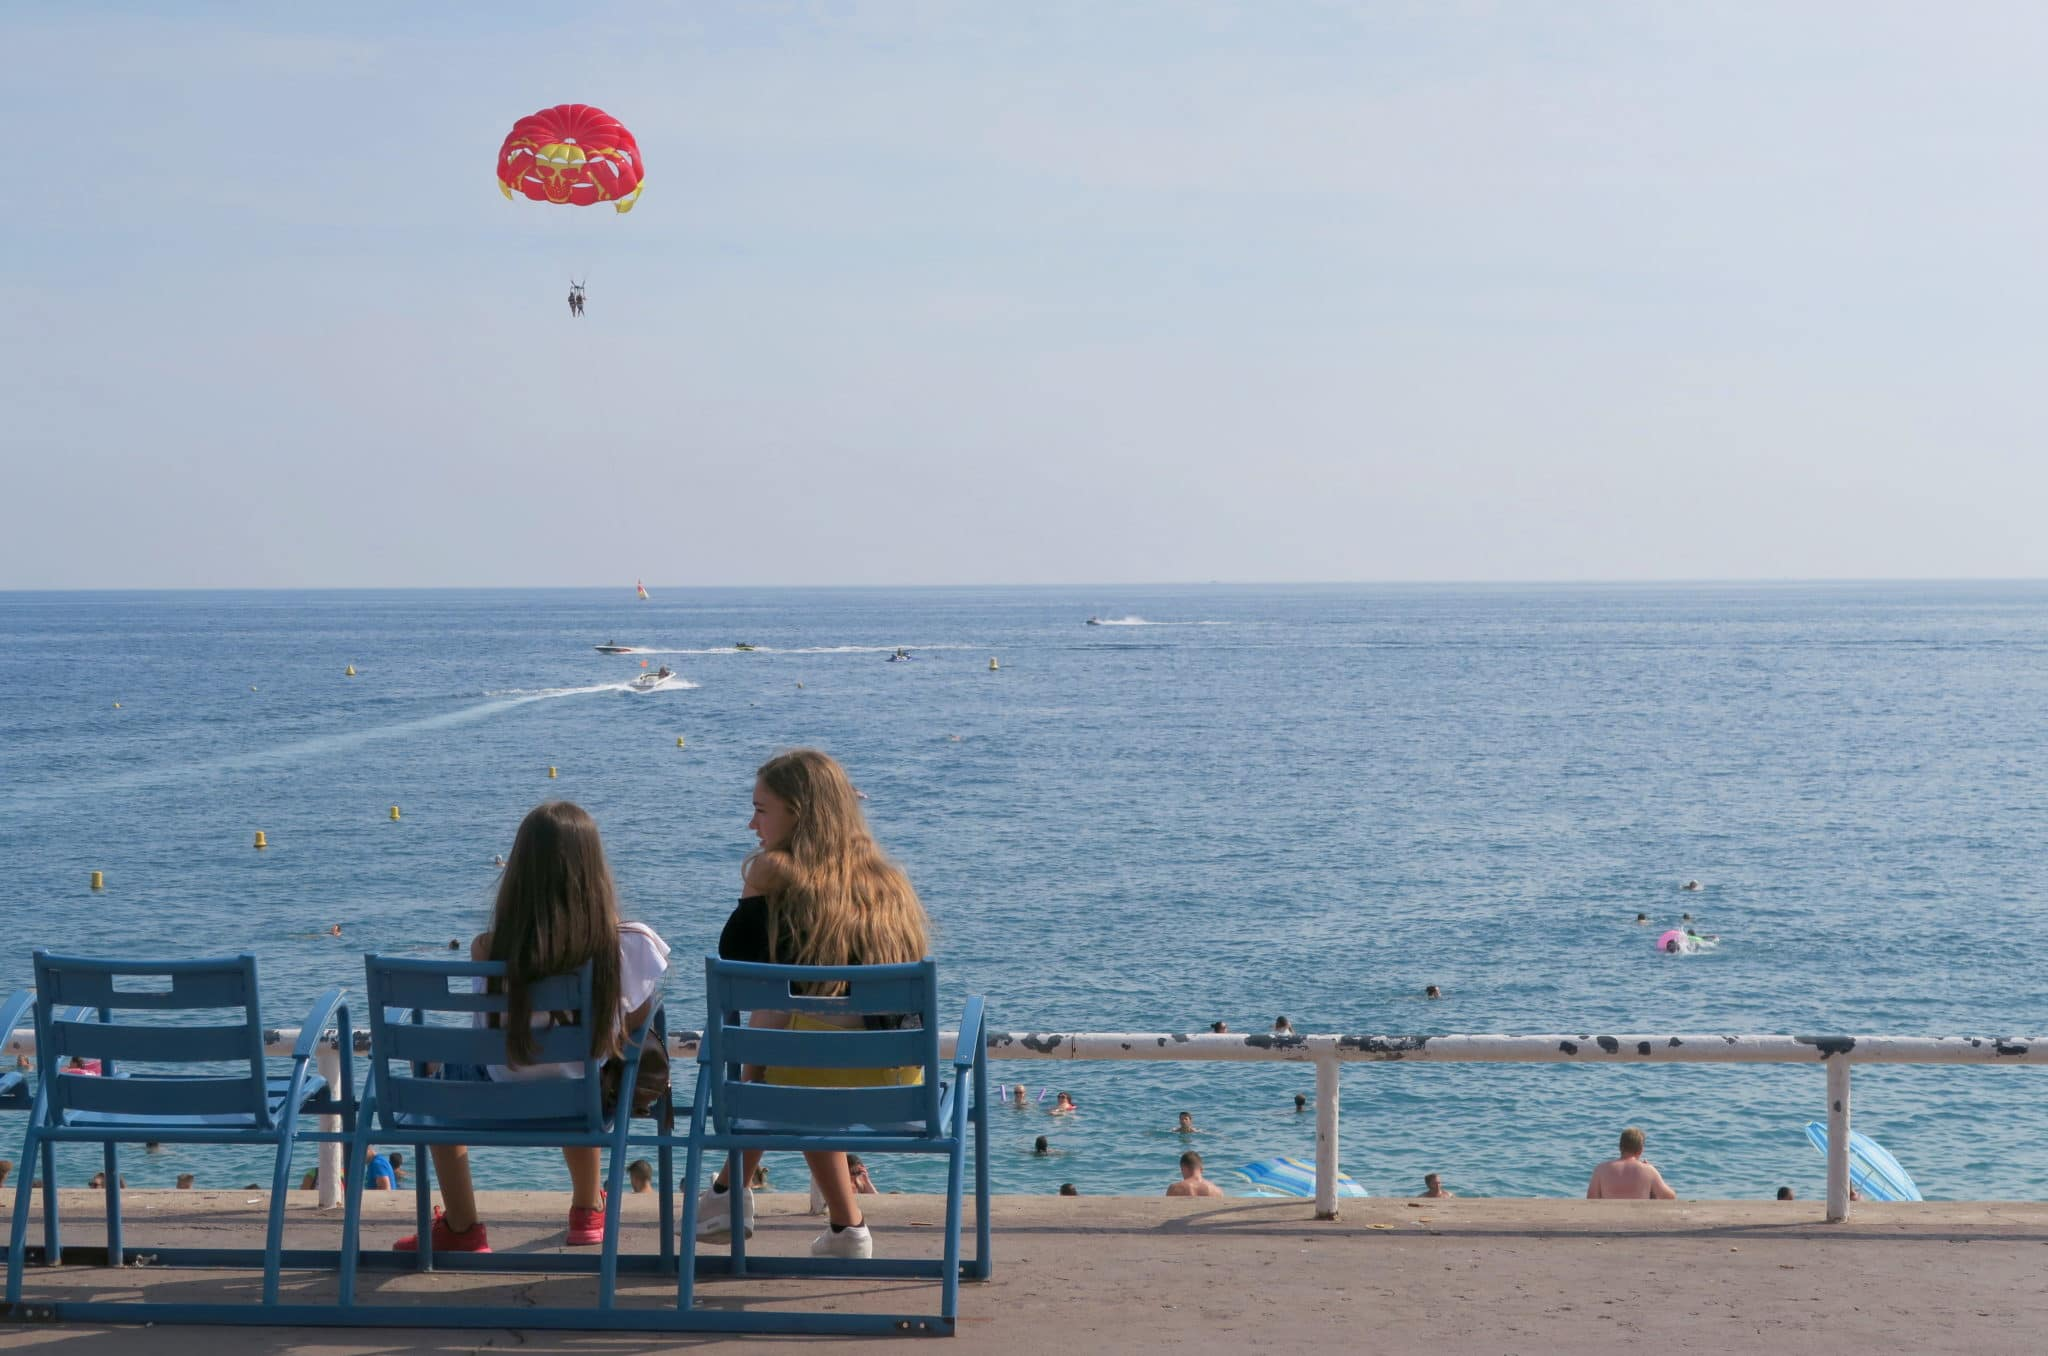 Promenade des Anglais - Nice seafront promenade - Visit Nice French Riviera